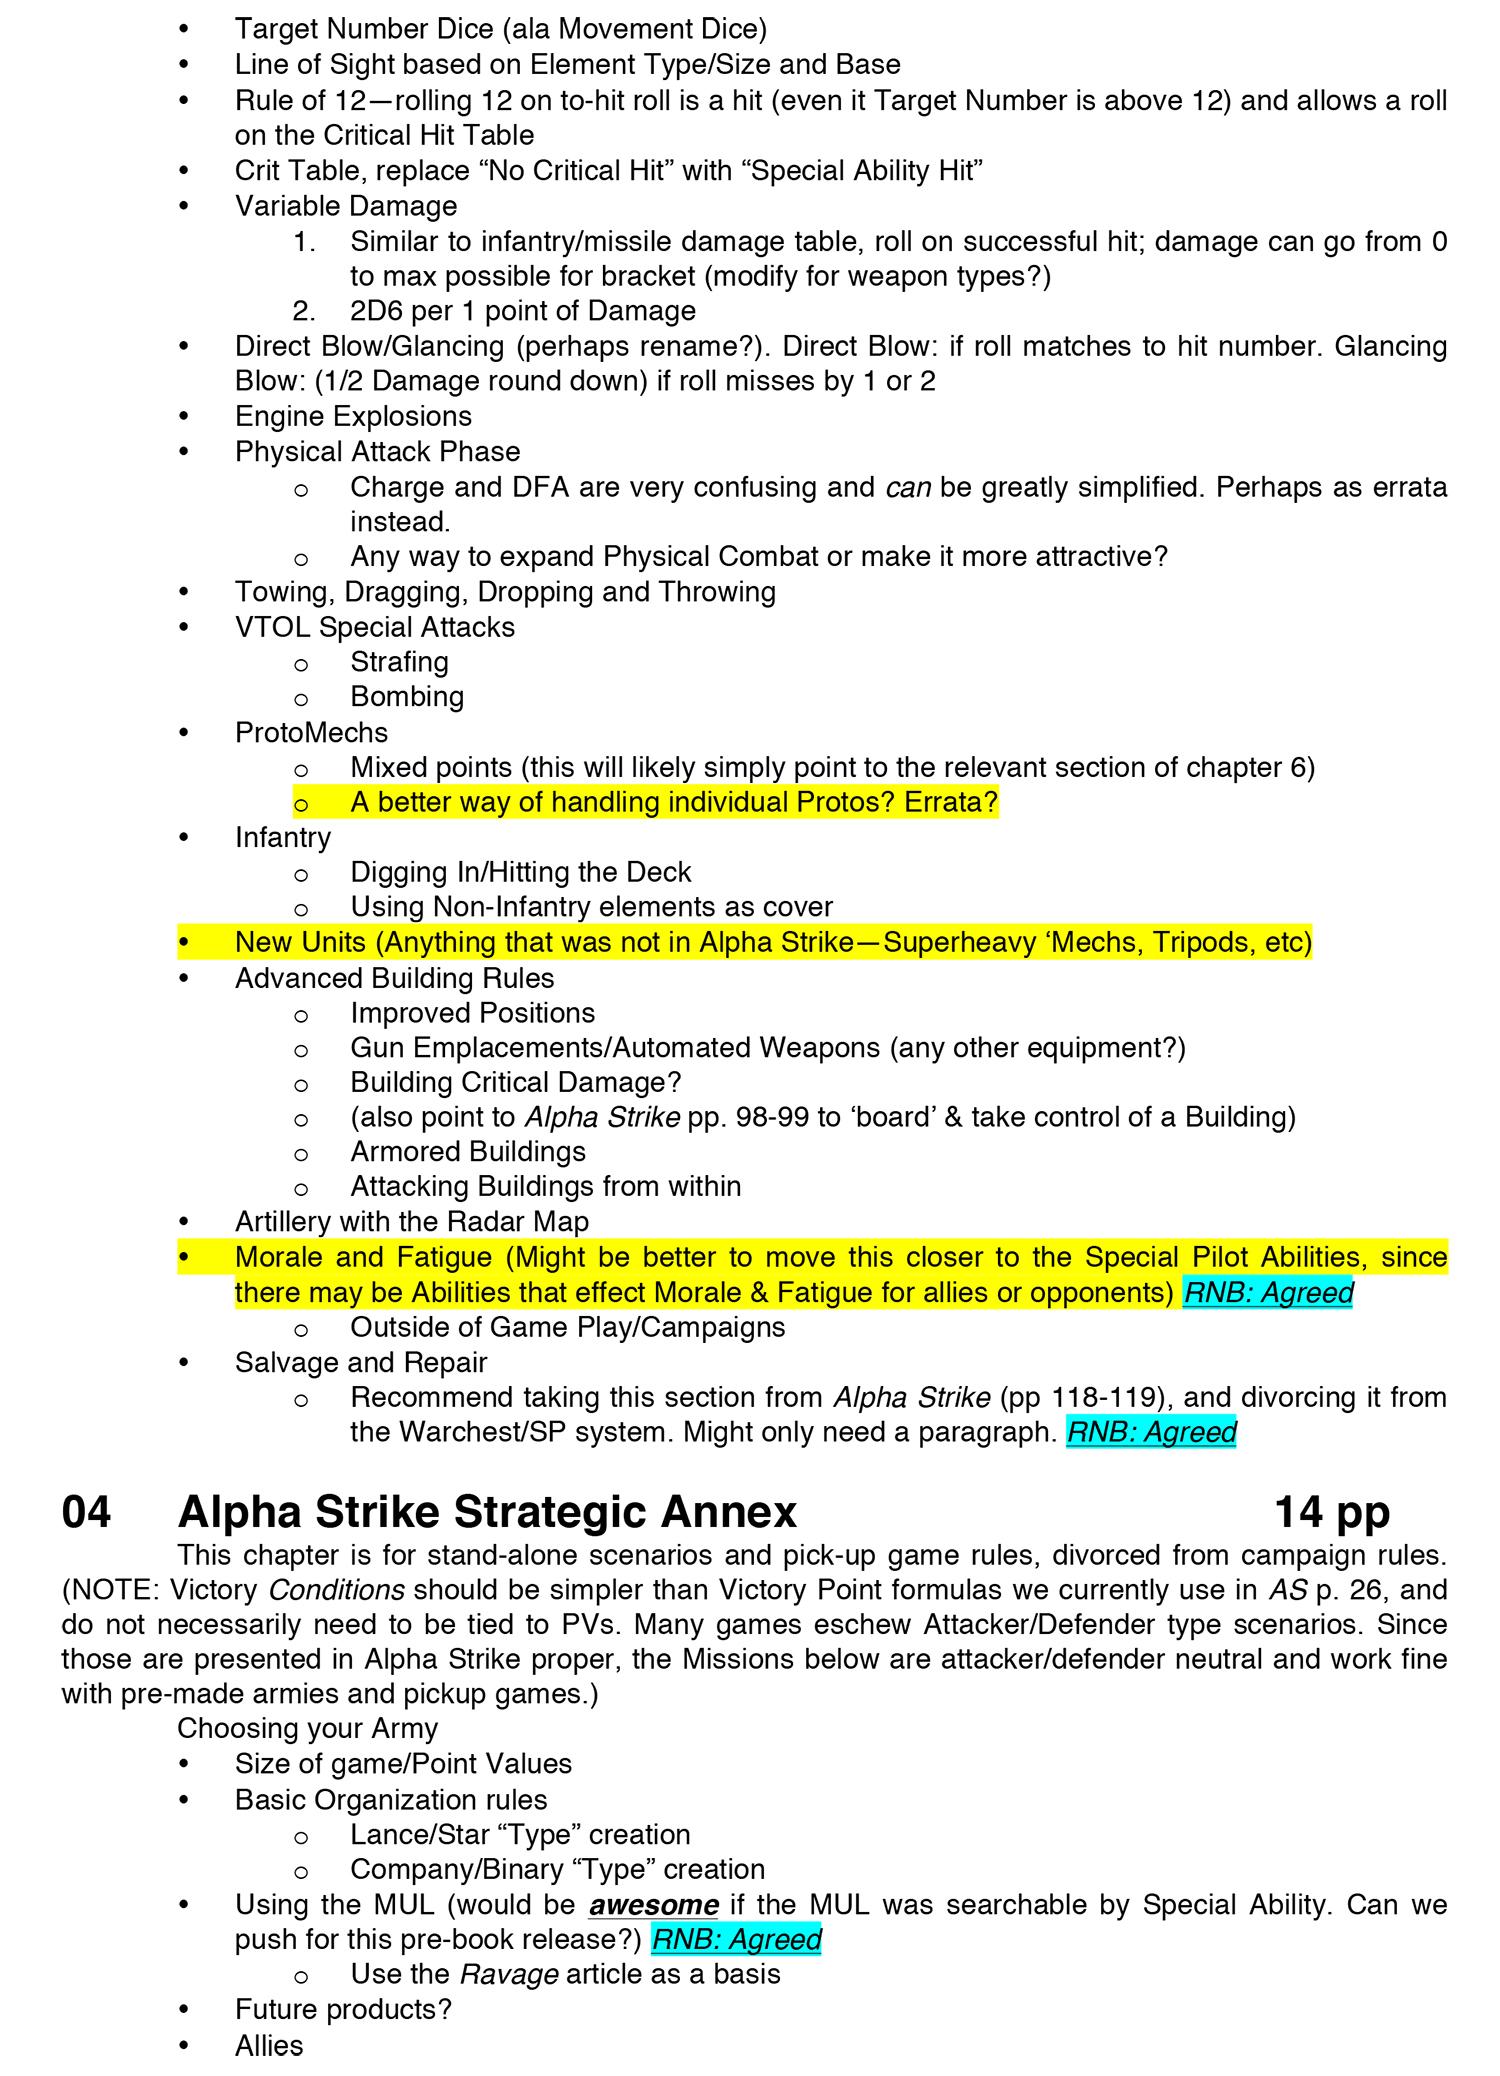 Microsoft Word - AlphaStrikeCompanionOutline_3.doc